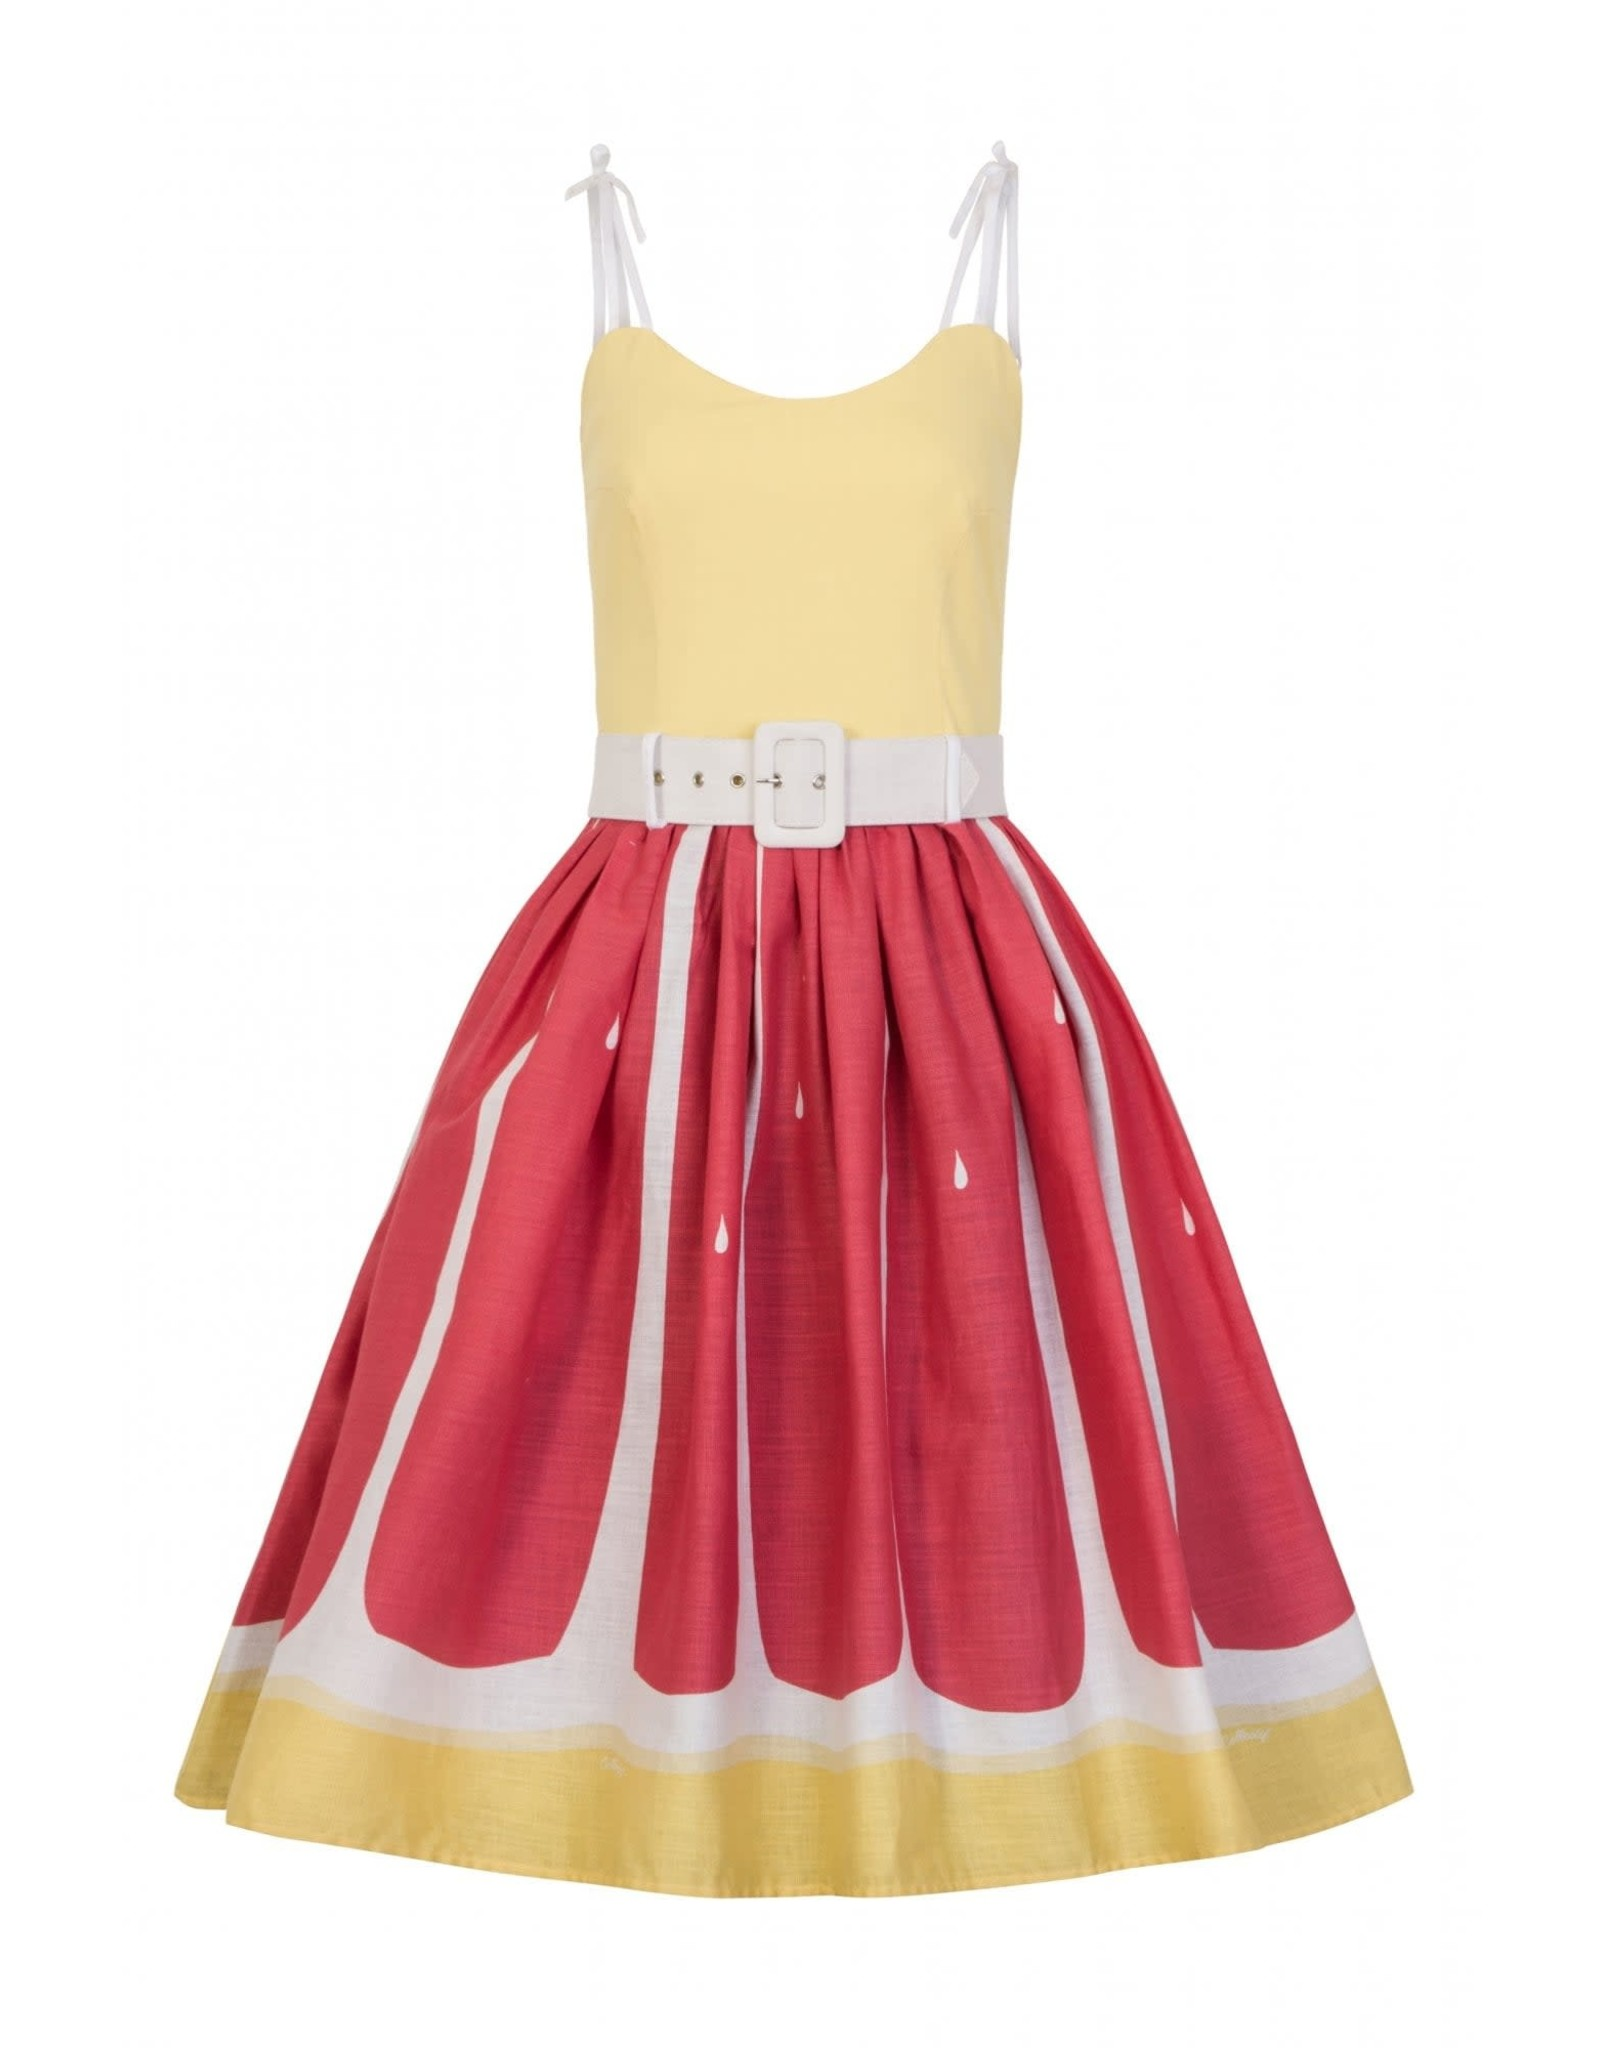 COLLECTIF - Jade Pink Grapefruit Swing Dress